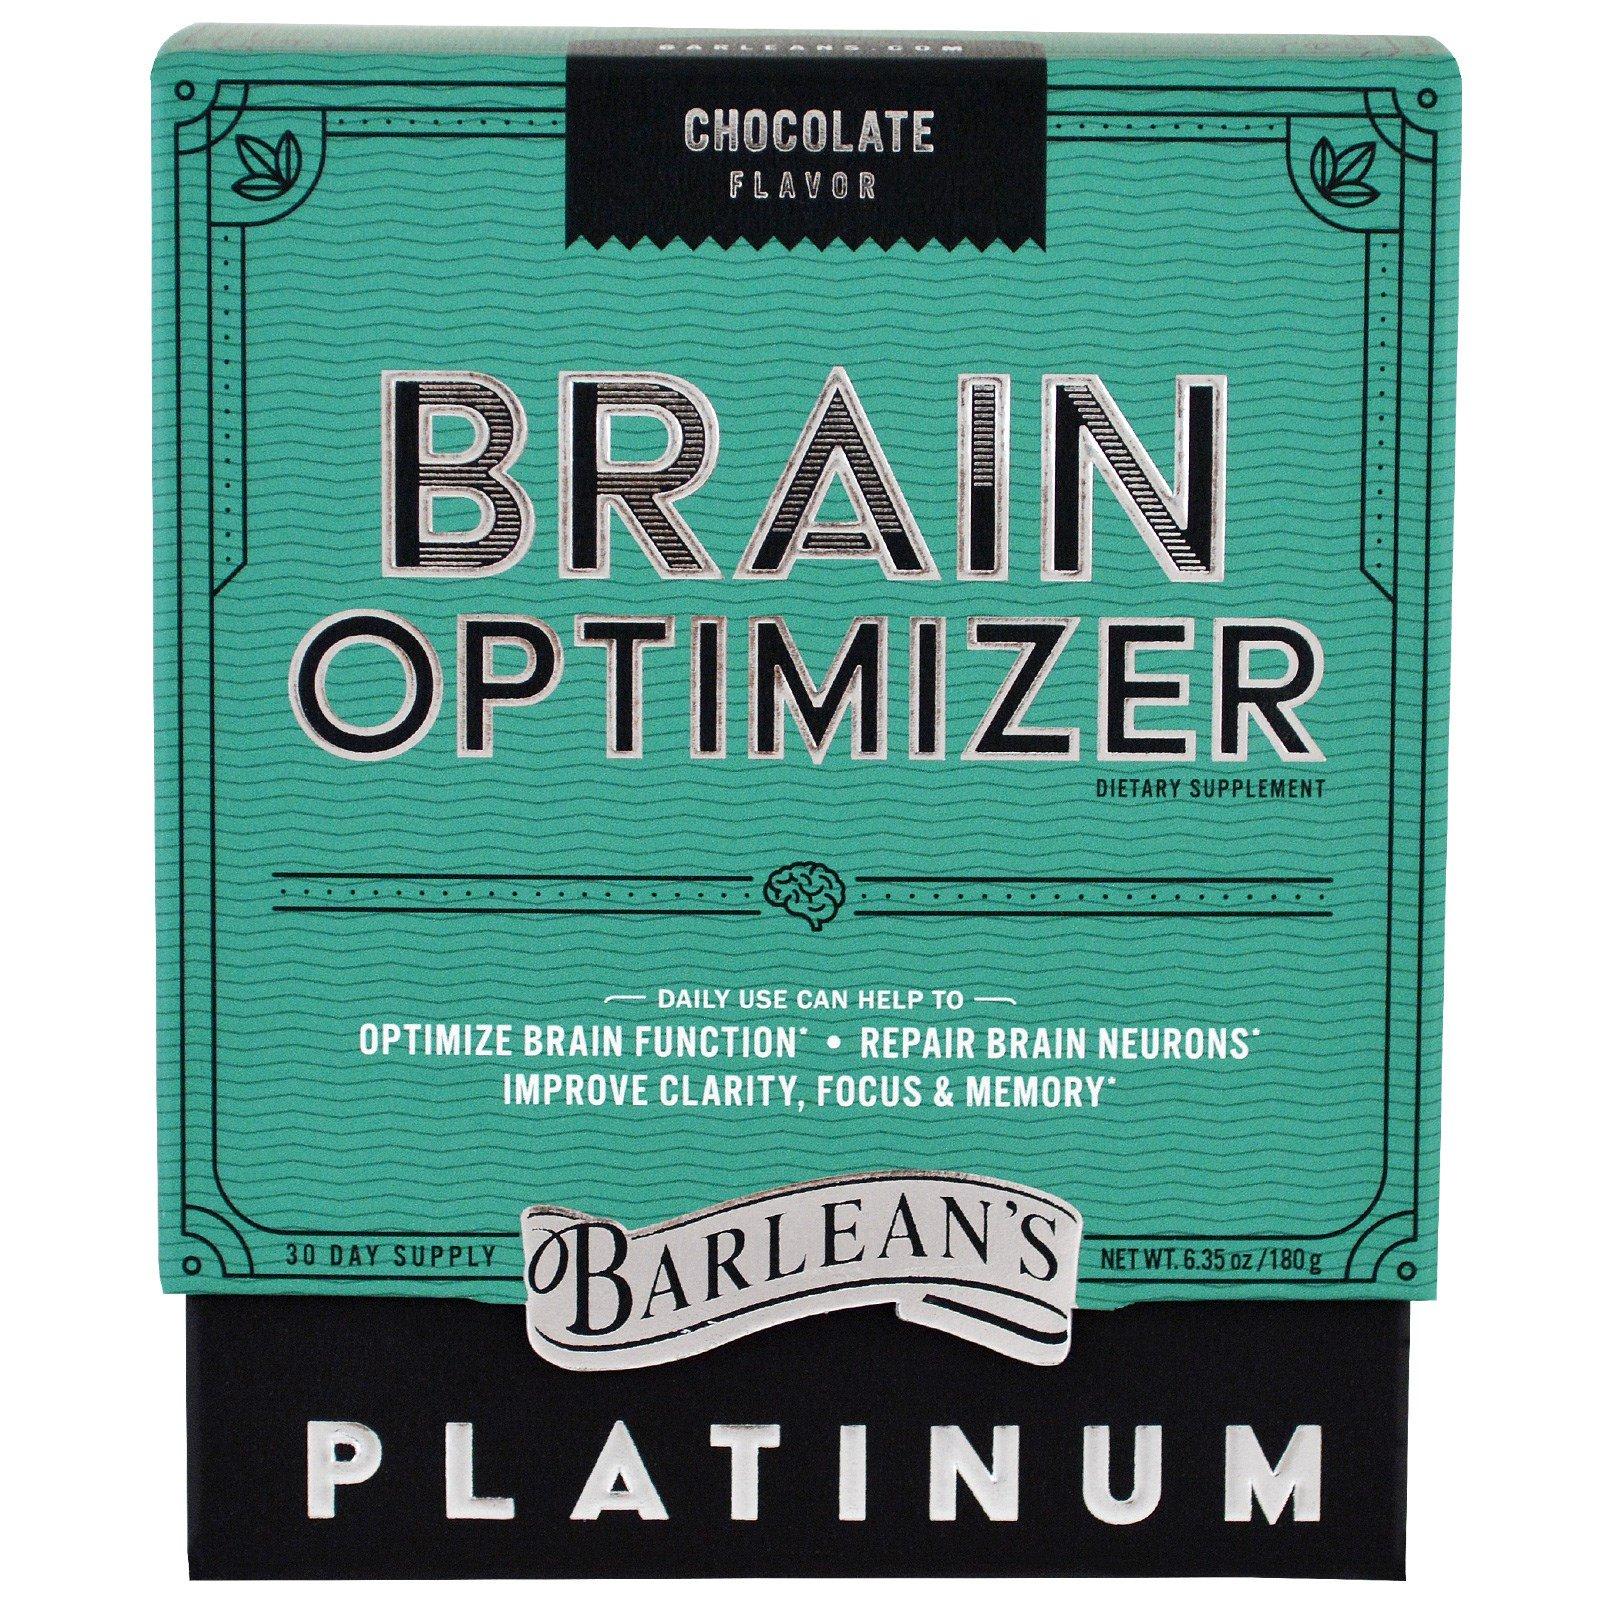 Barlean's, Оптимизатор мозга, шоколадный вкус, 6,35 унц. (180 г)